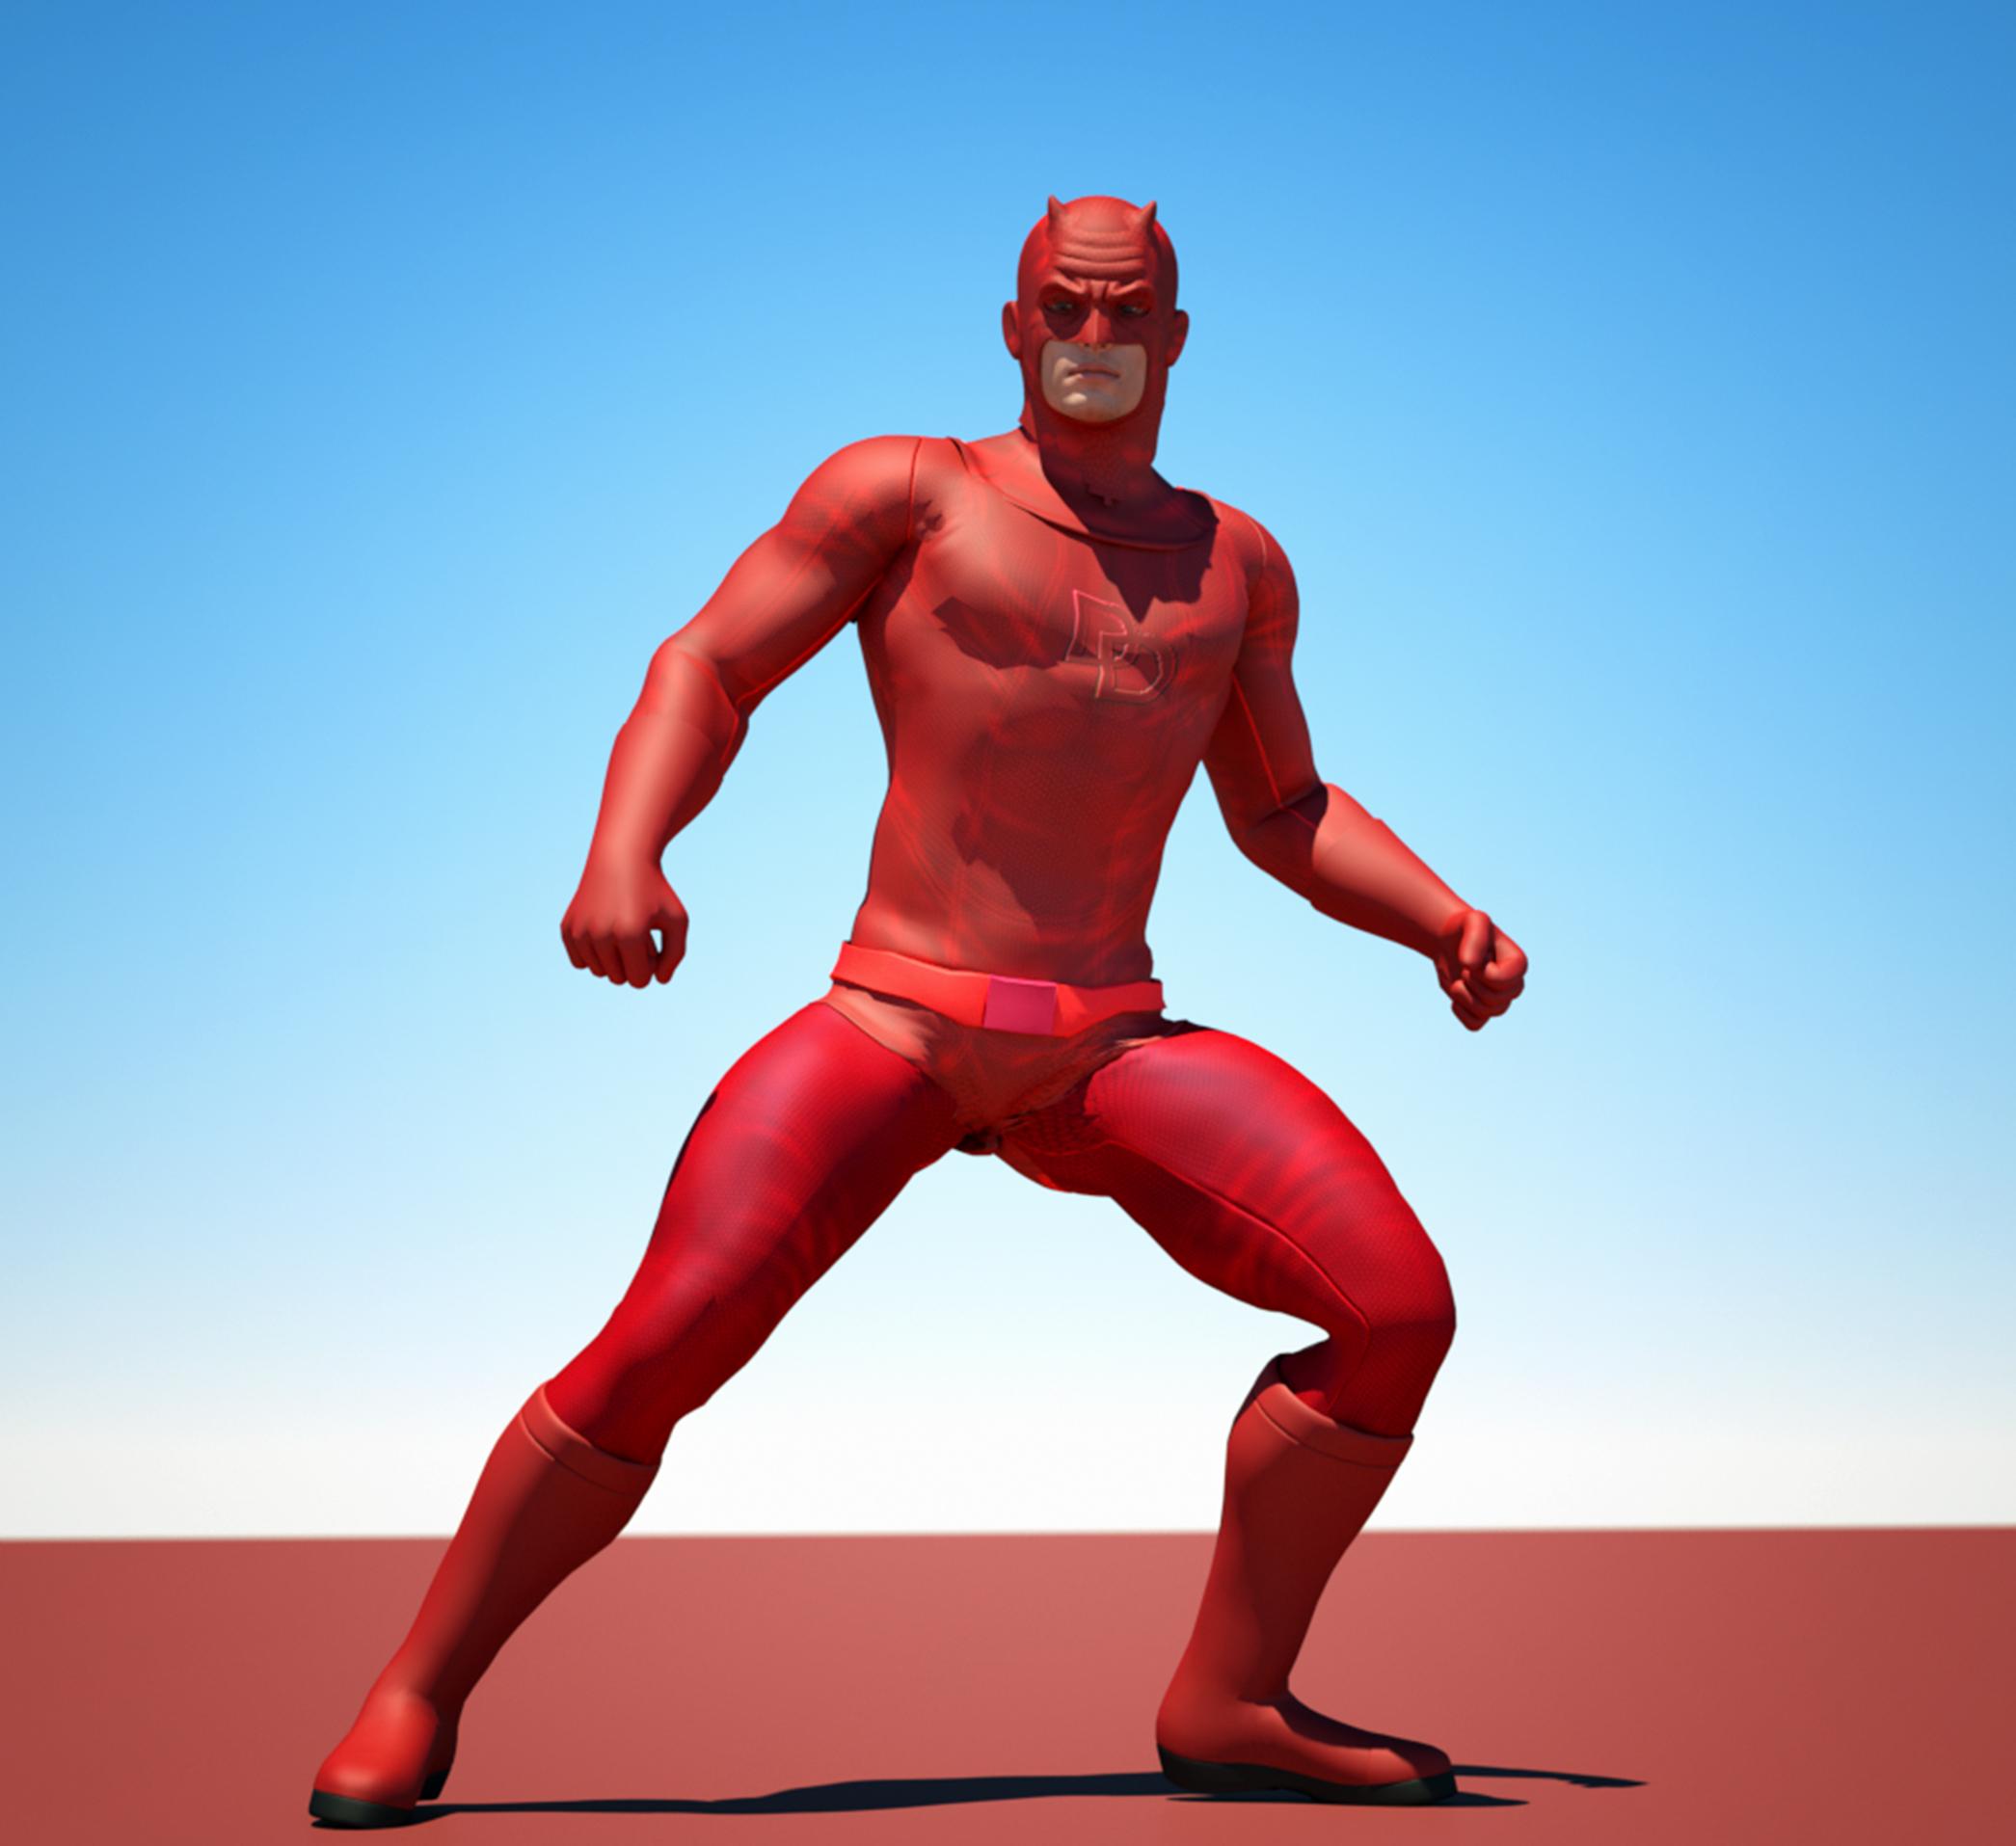 Daredevil textures 4 Goldenage suit